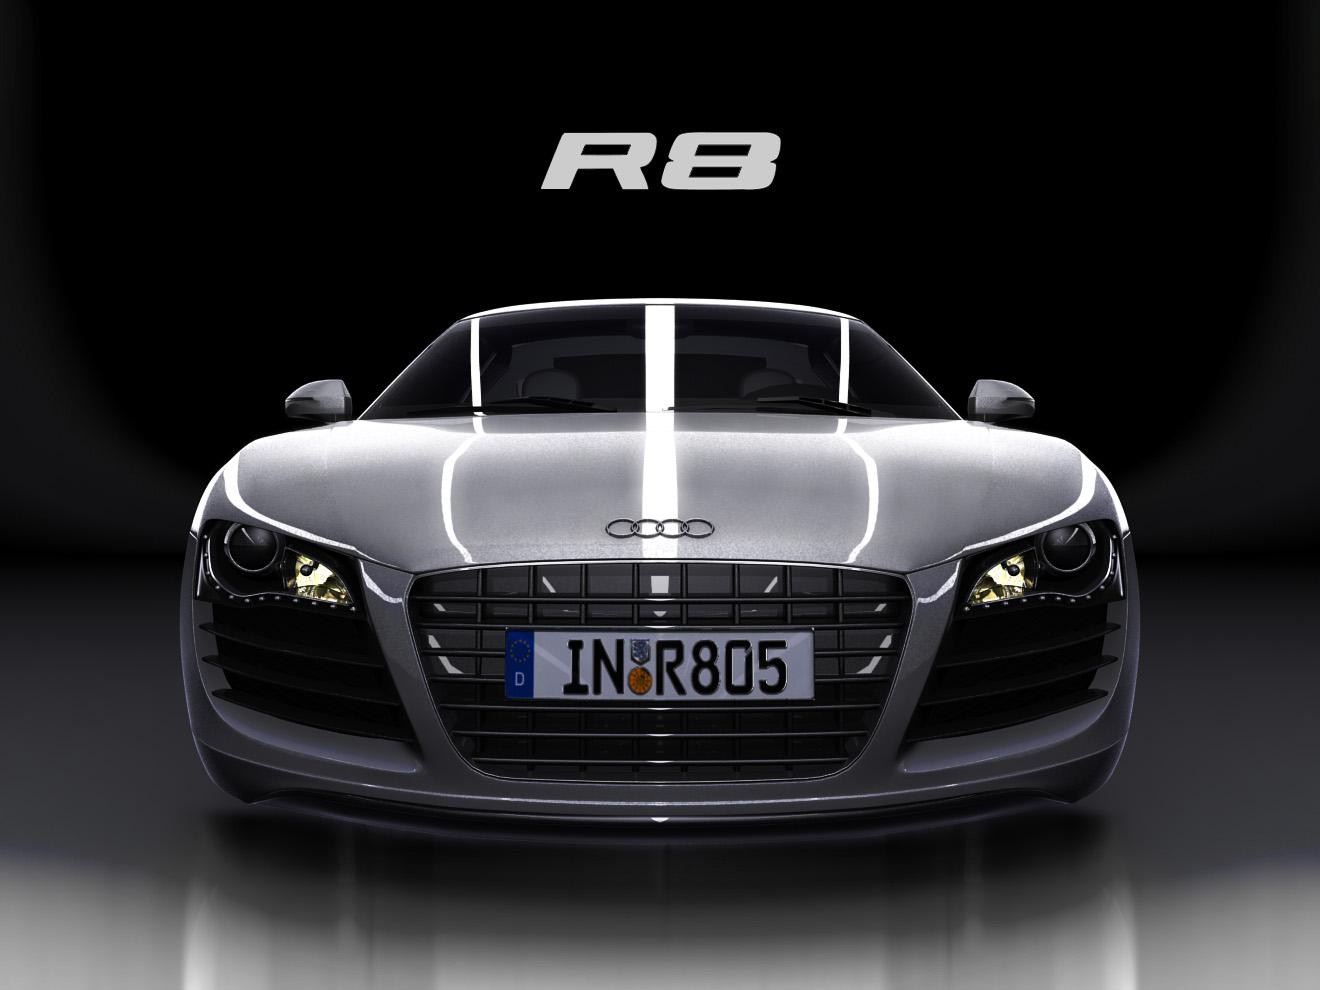 E Car Wallpaper Audi R8 Wallpaper Hd Review